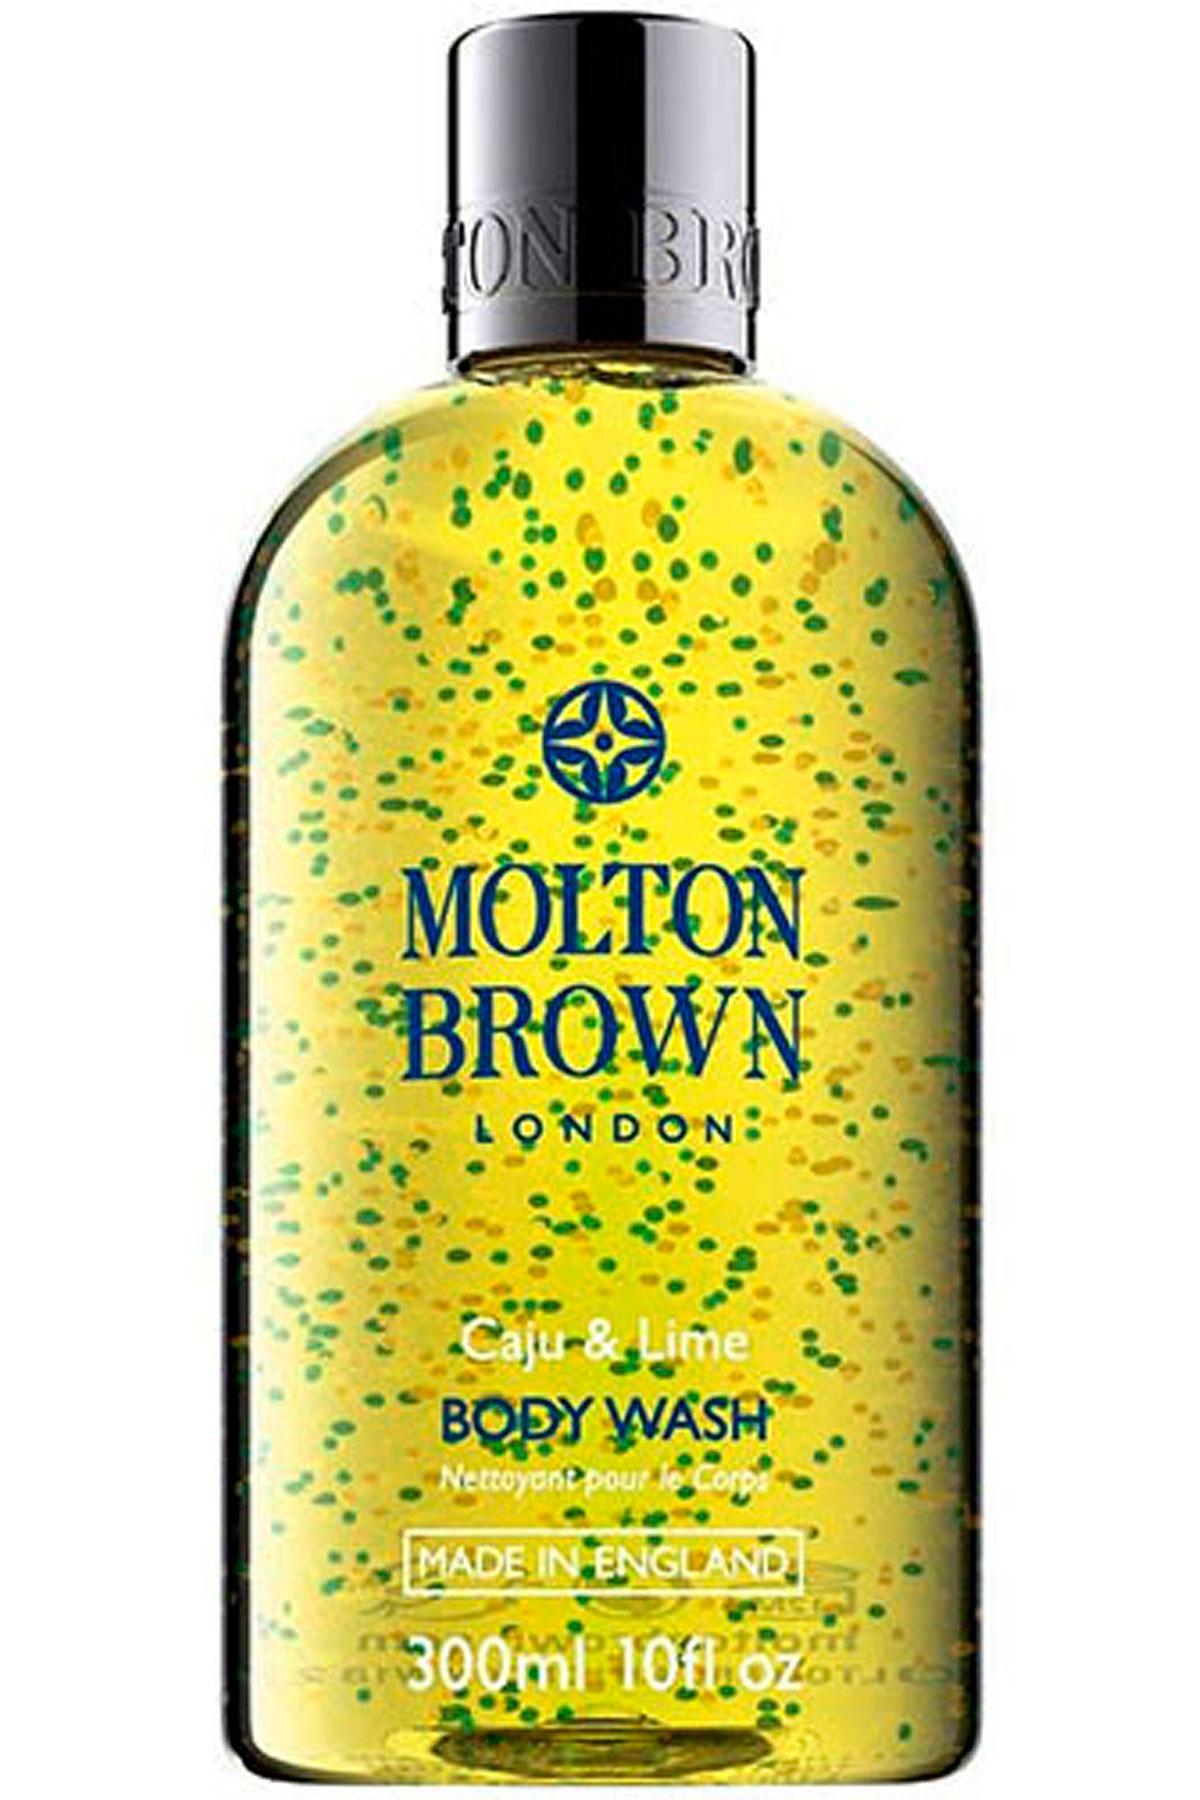 Molton Brown Beauty for Women, Caju & Lime - Body Wash - 300 Ml, 2019, 300 ml